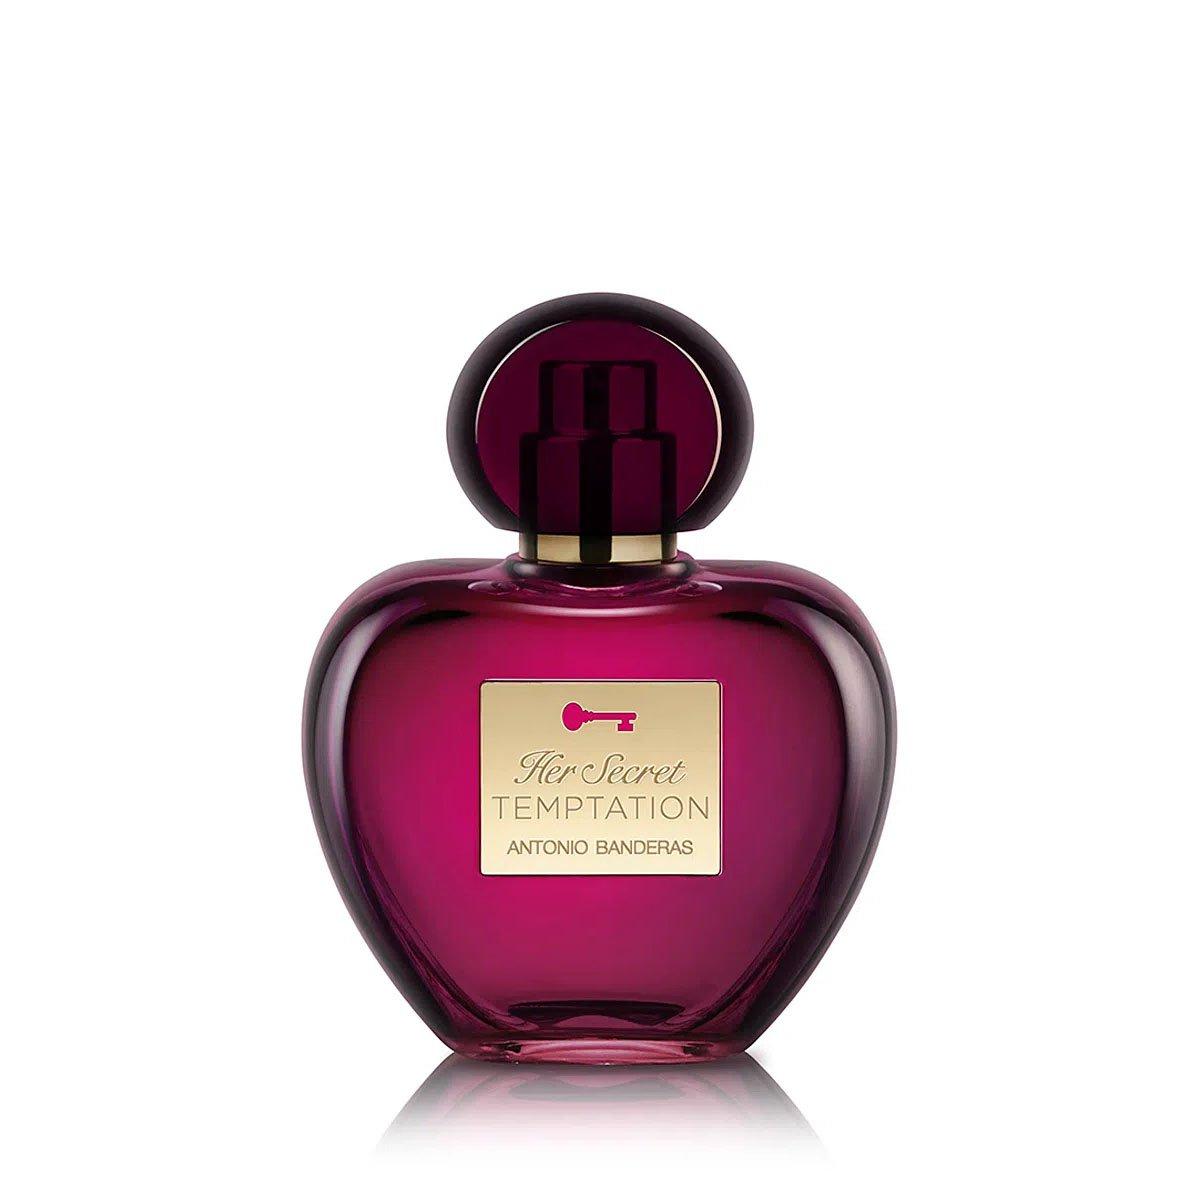 perfume antonio banderas her secret temptation feminino edt 80 ml 50743 2000 202348 5